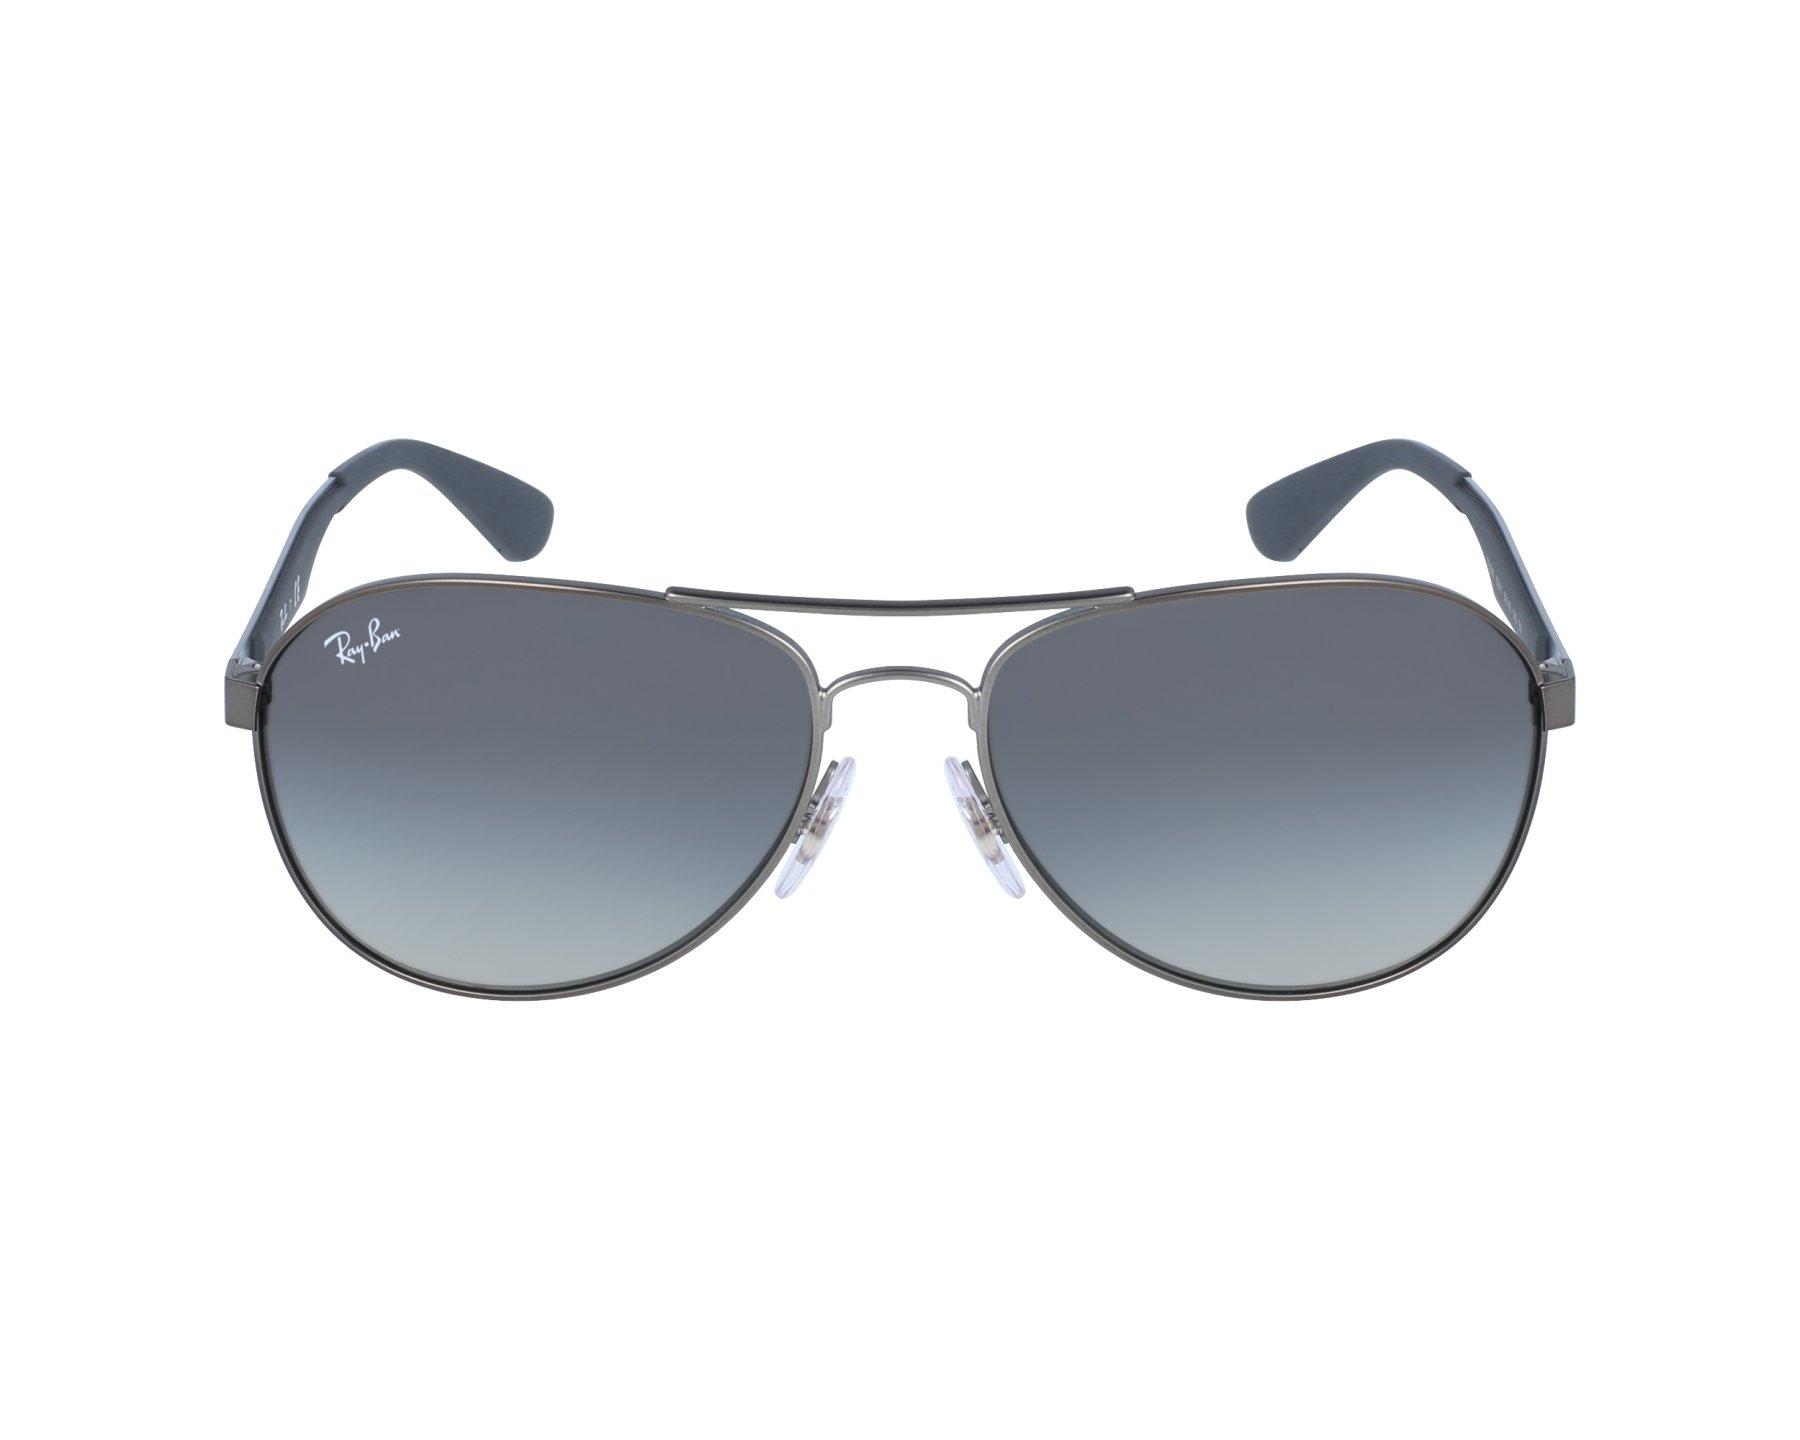 95afb898fb16 Sunglasses Ray-Ban RB-3549 029 11 58-16 Gun Grey profile